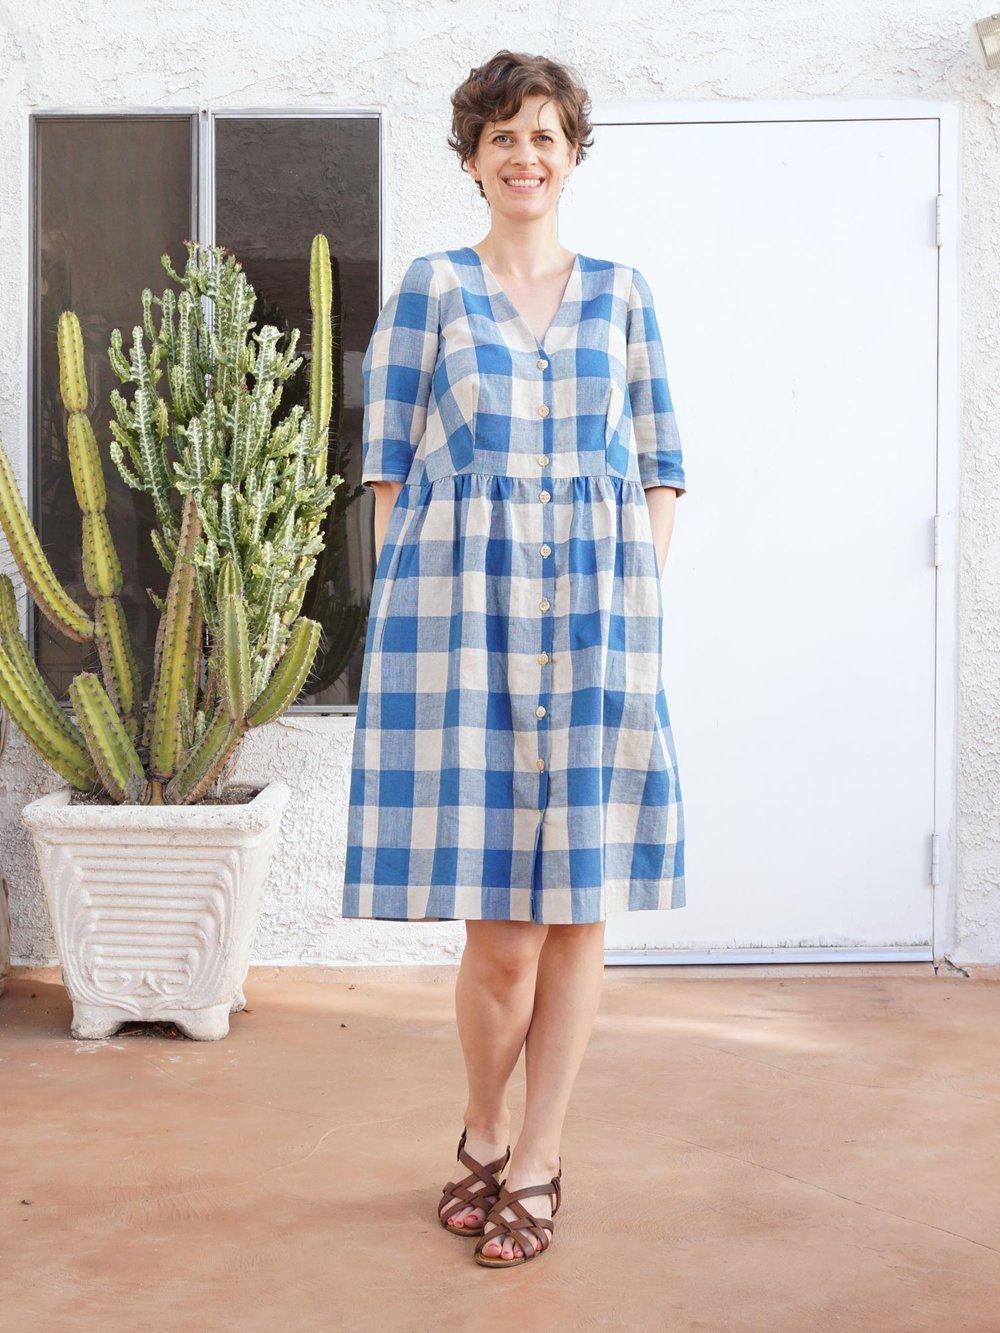 Herrenhemden tolles Oversize Kleid basteln